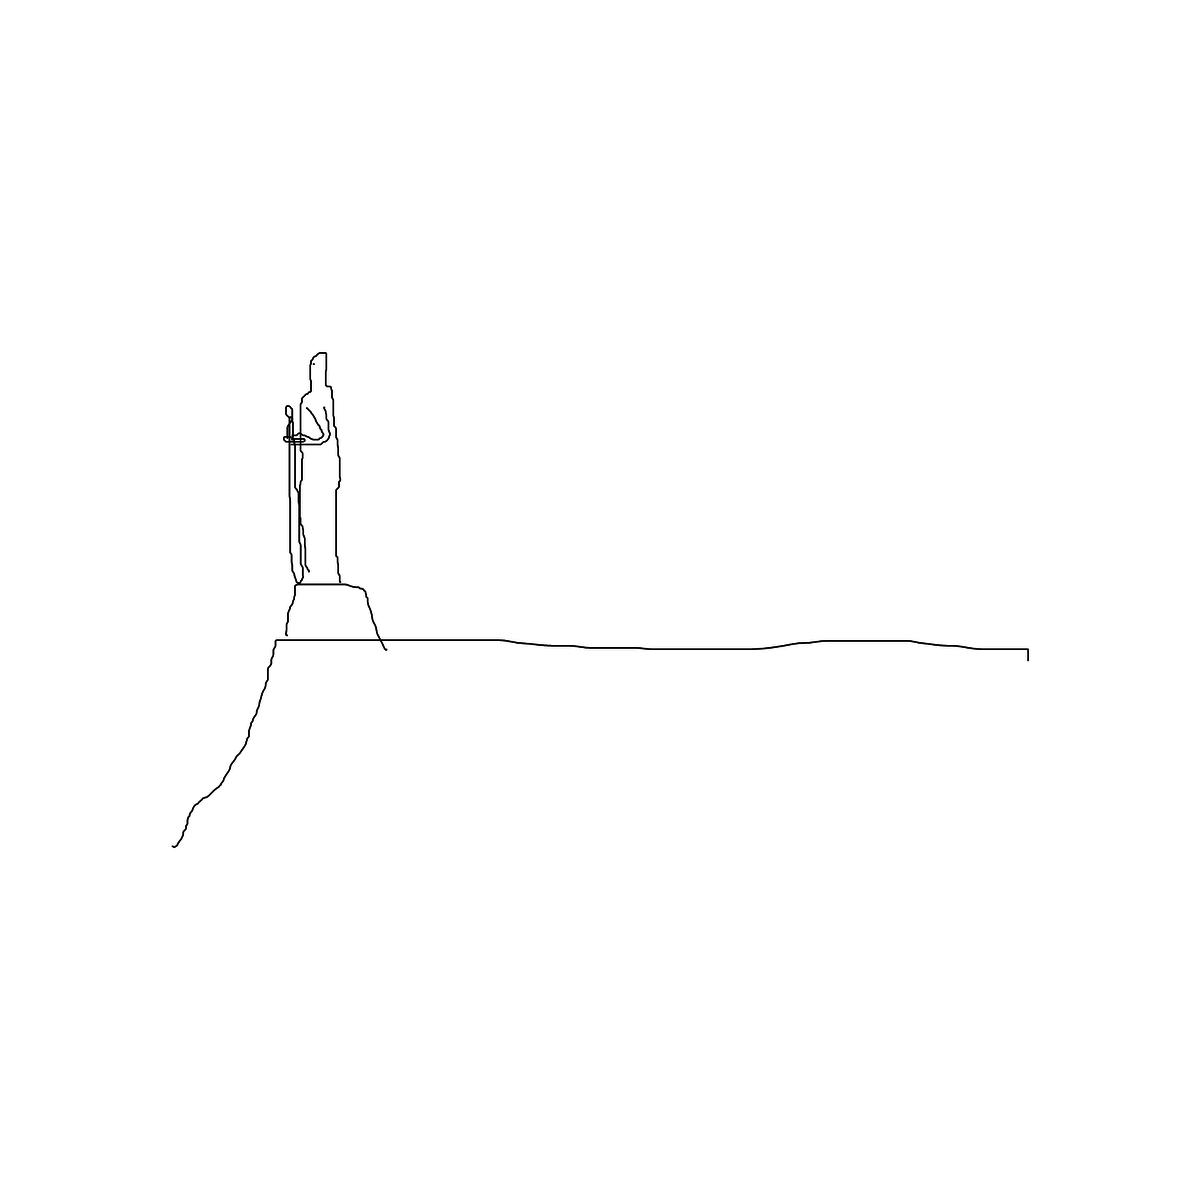 BAAAM drawing#7575 lat:44.8262443542480500lng: 20.4468154907226560